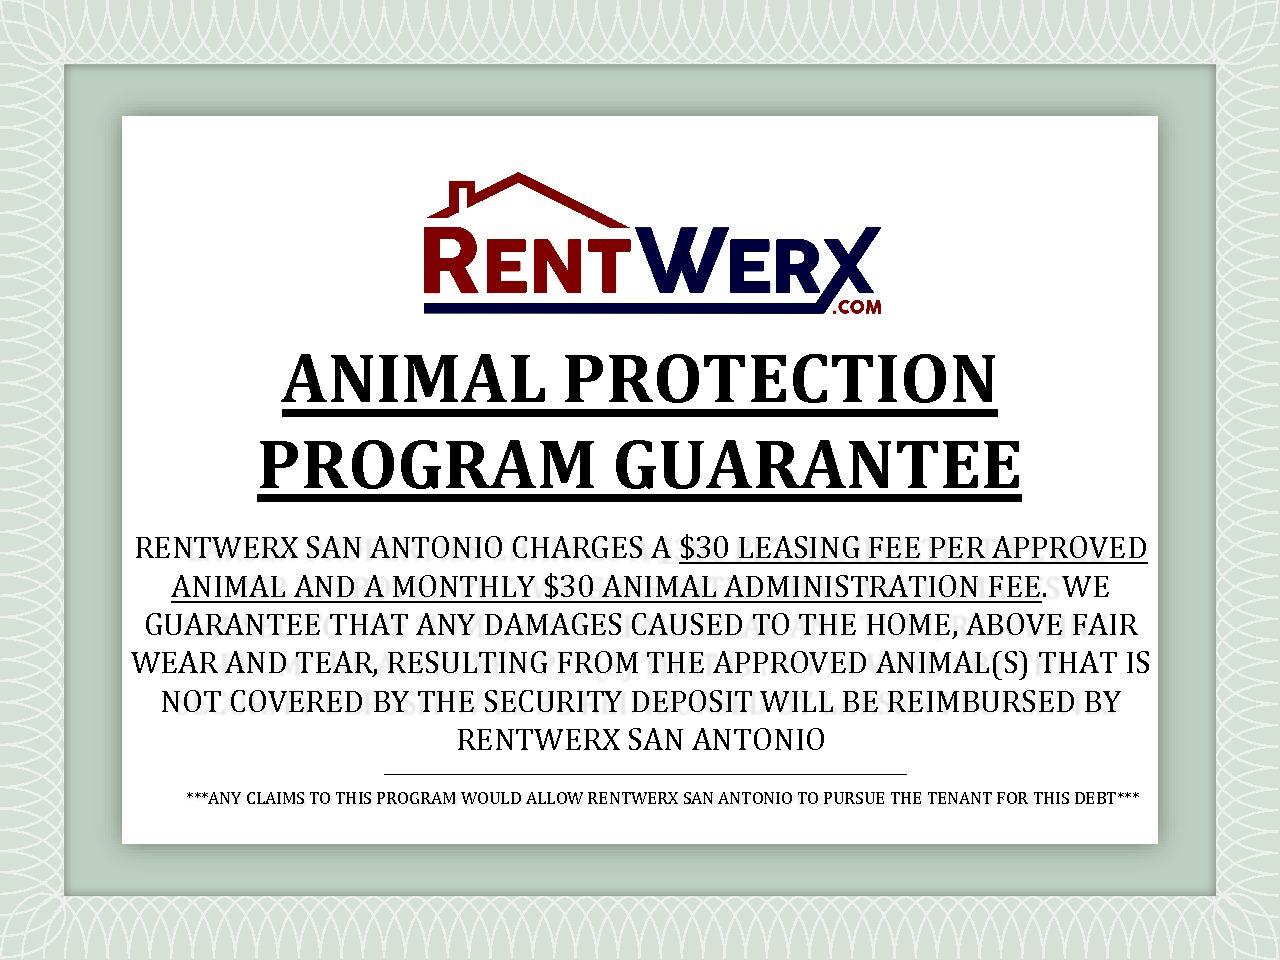 Animal Protection Program Rentwerx San Antonio